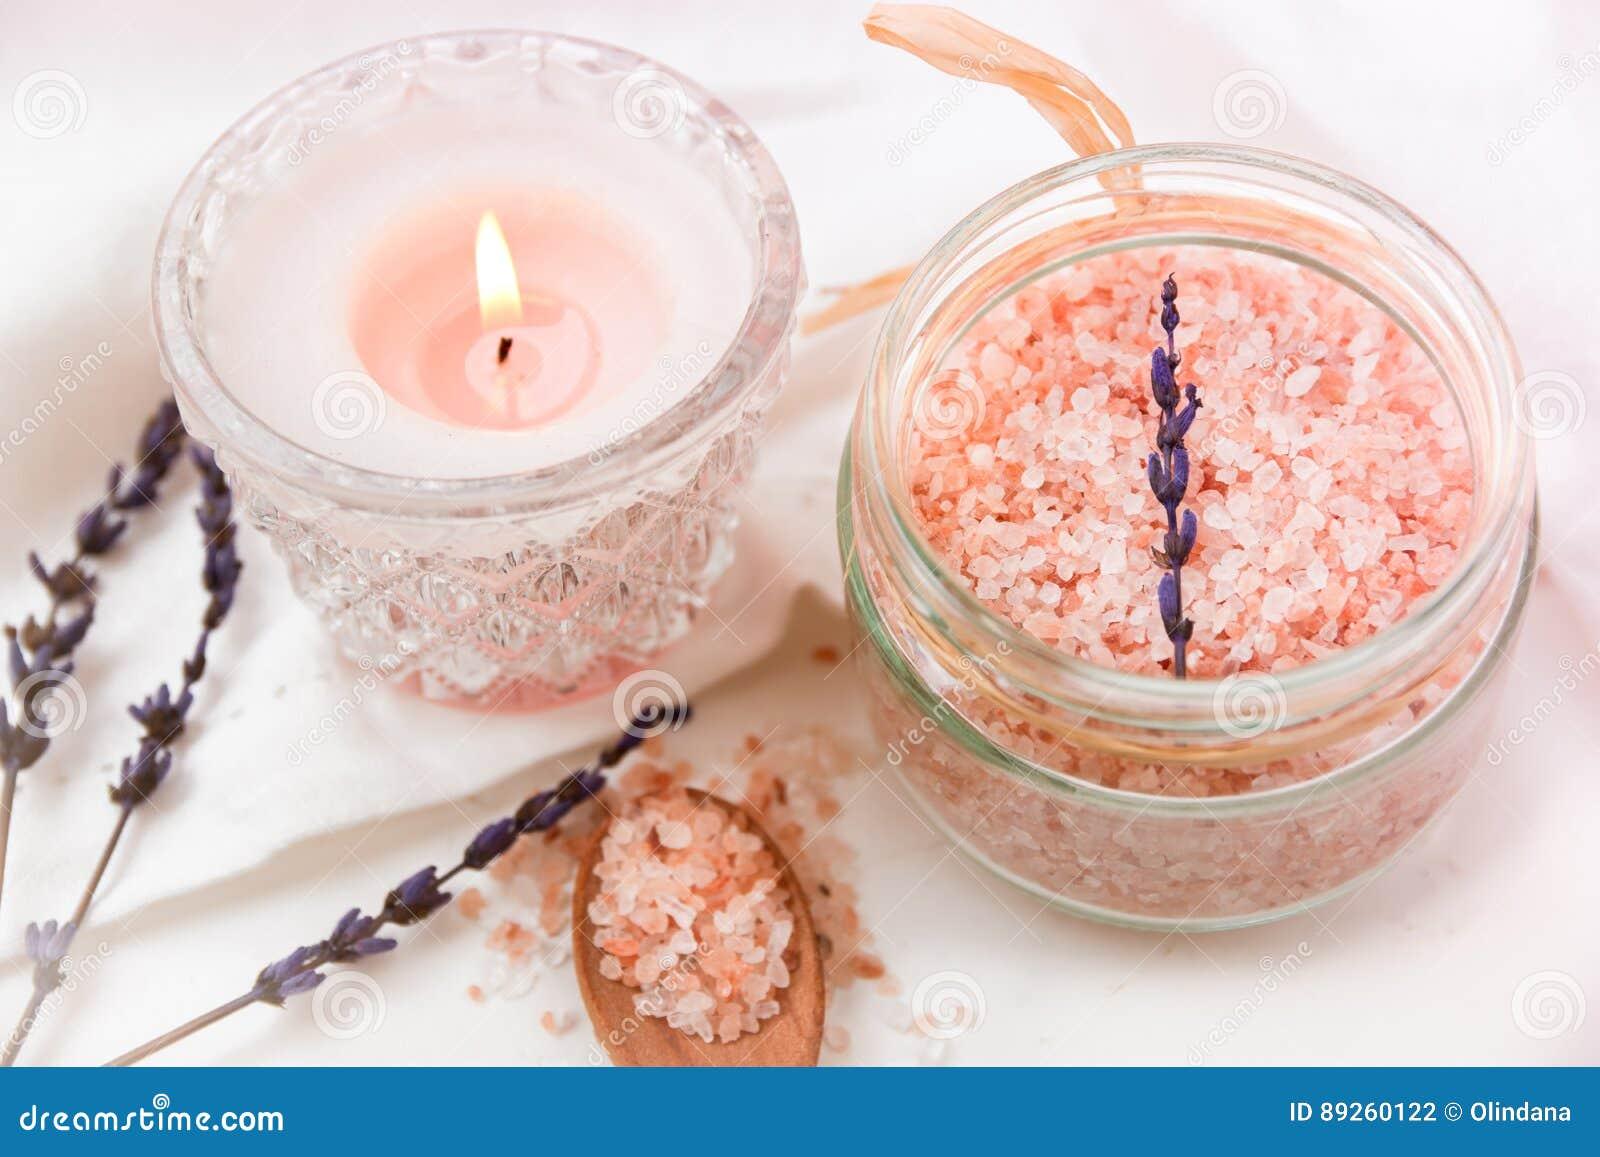 Pink Himalayan Salt In Glass Jar, Burning Candle Wood Spoon